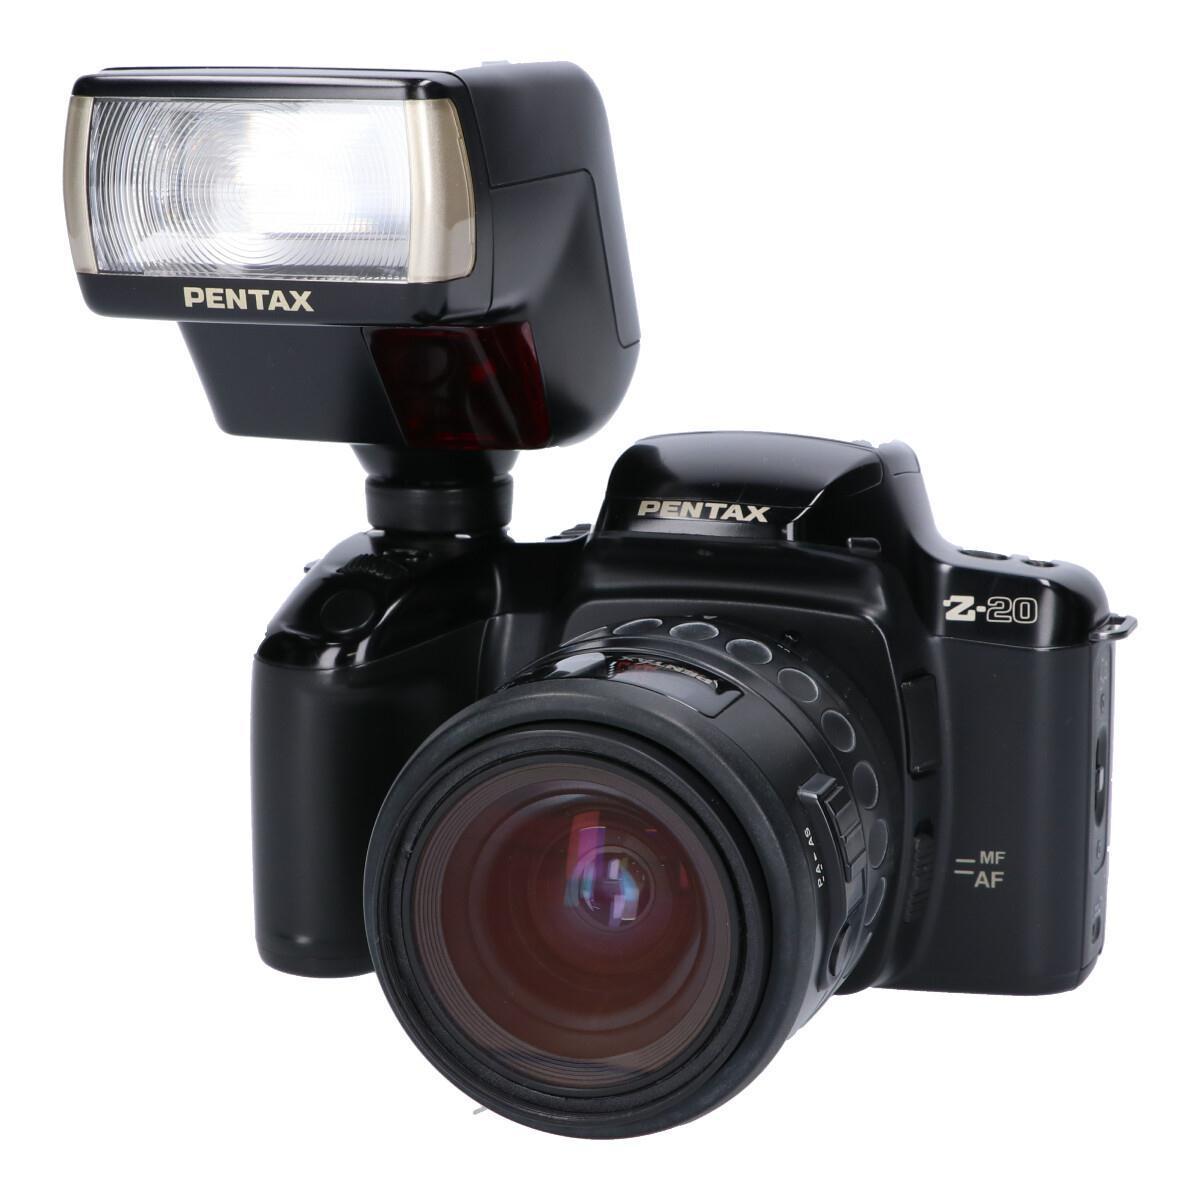 PENTAX Z-20 28-80KIT